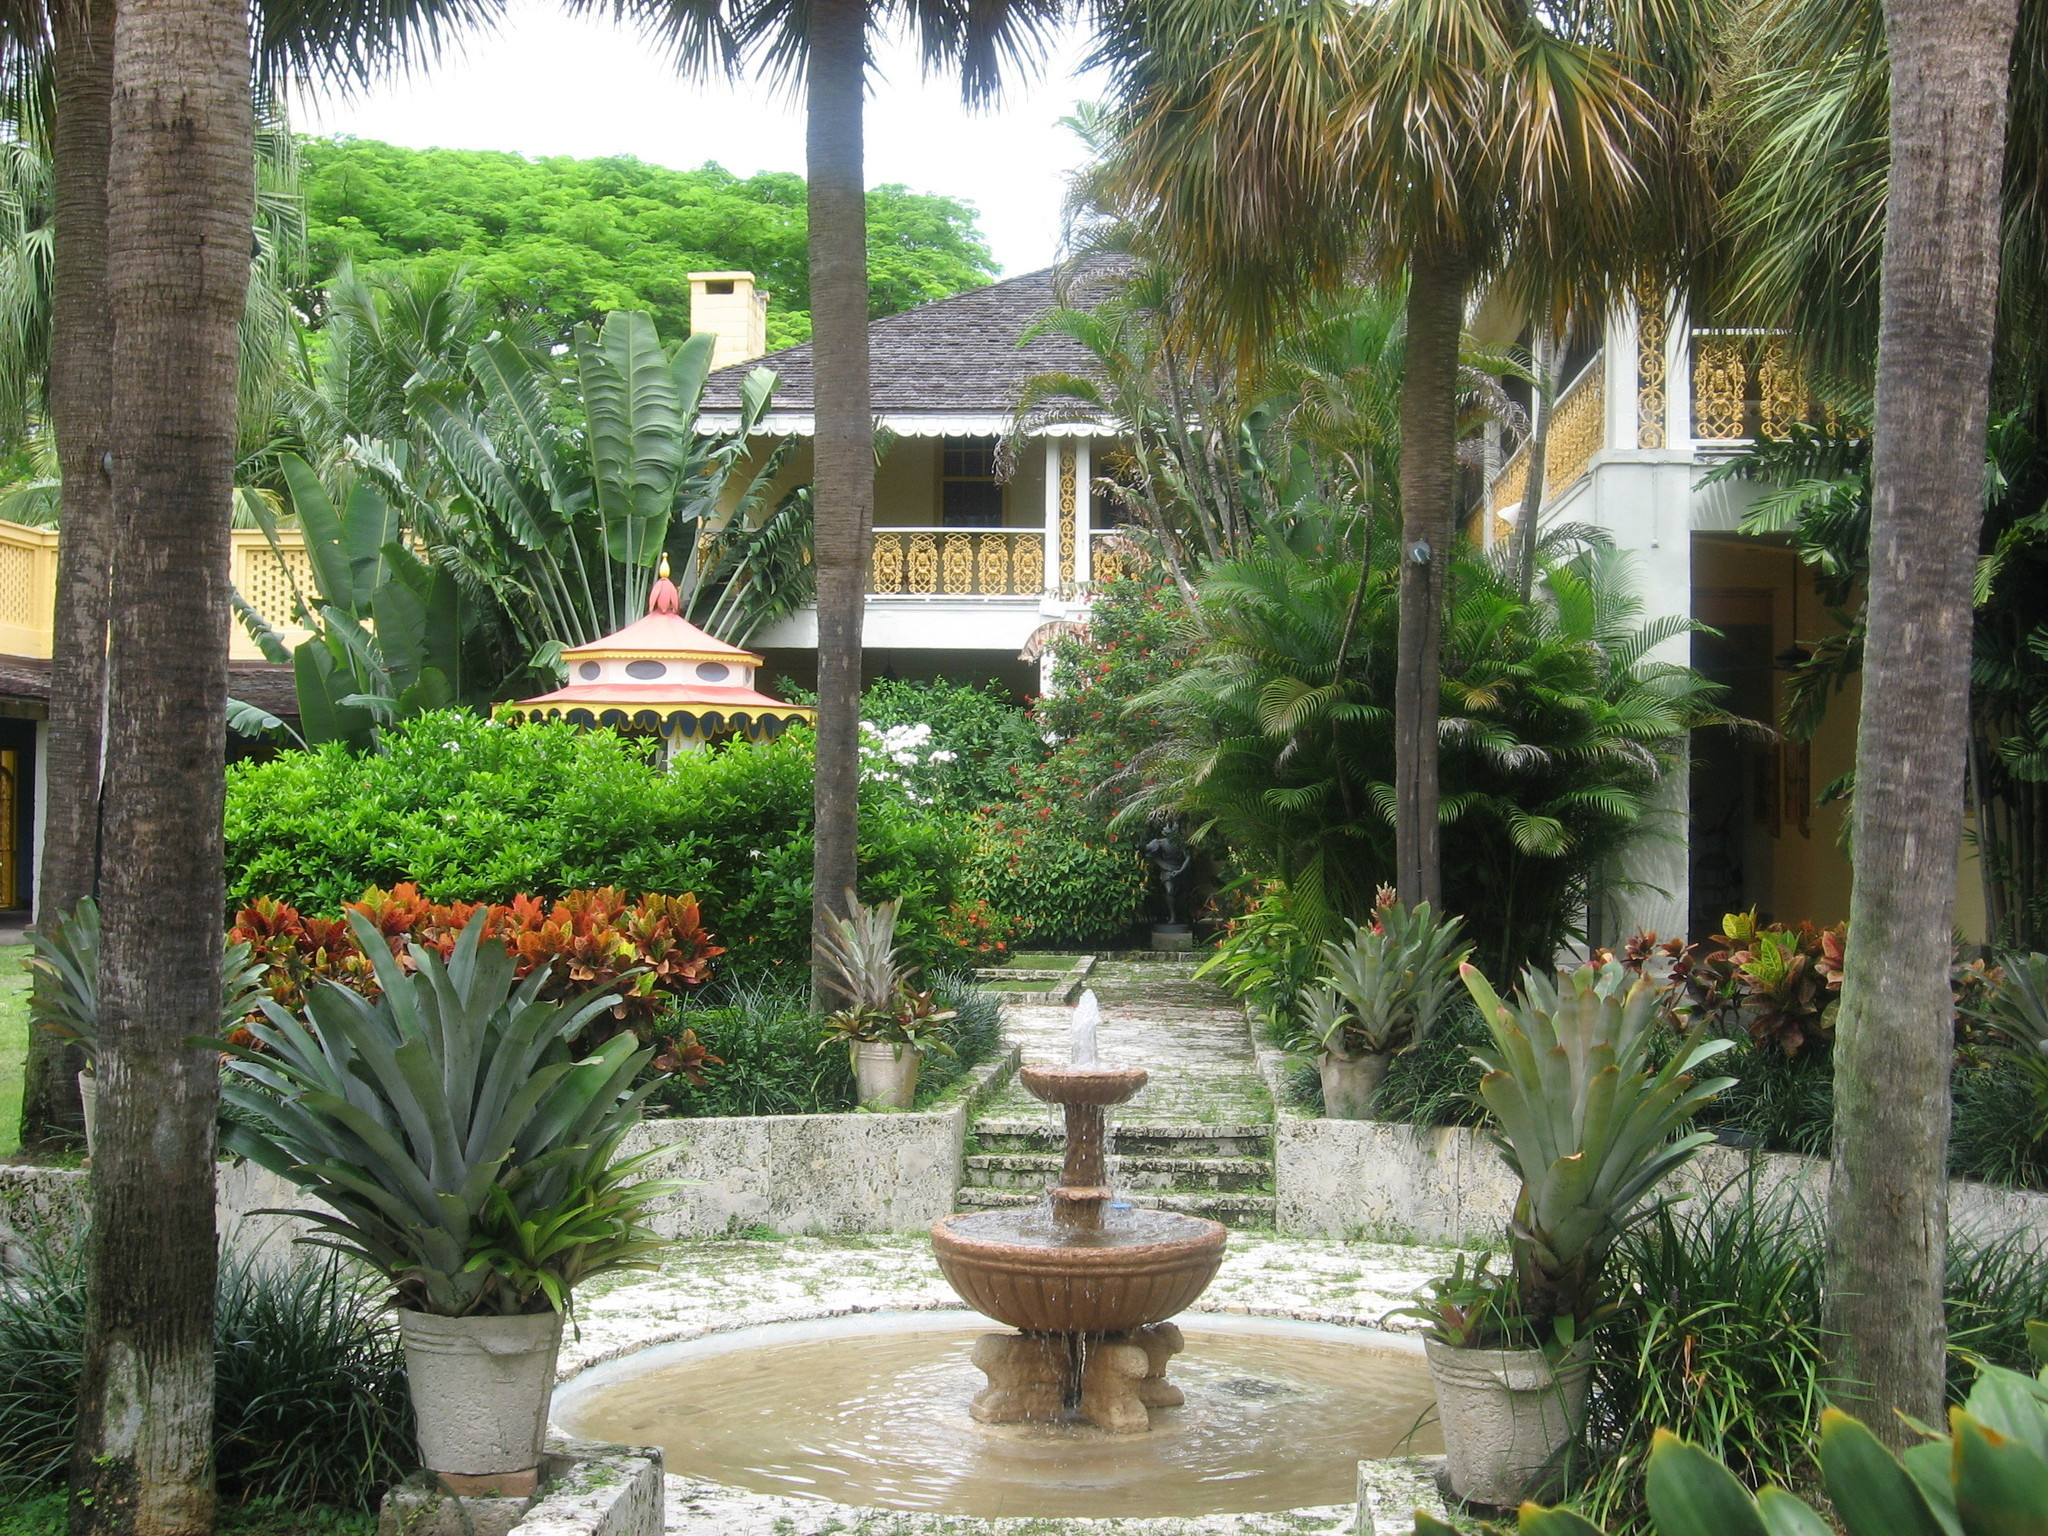 Bonnet House Museum Gardens To Showcase South Florida Themed Art Exhibit On Jan 16 Sun Sentinel